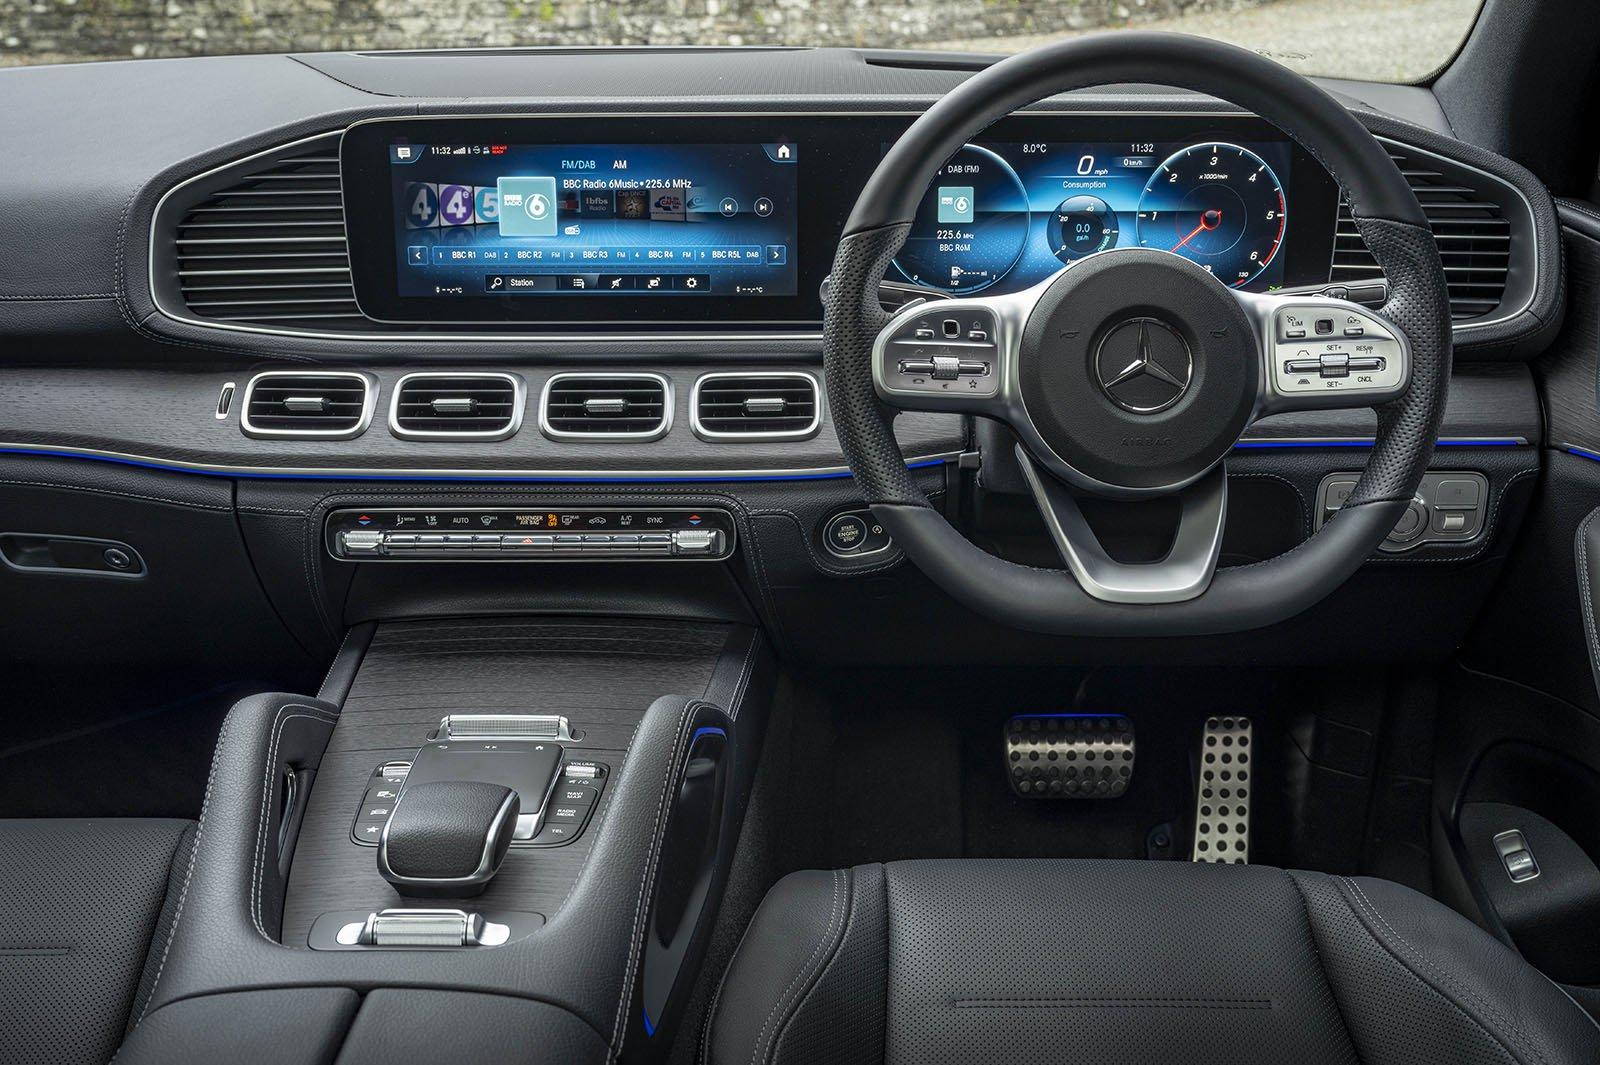 Mercedes GLE Coupé Dashboard